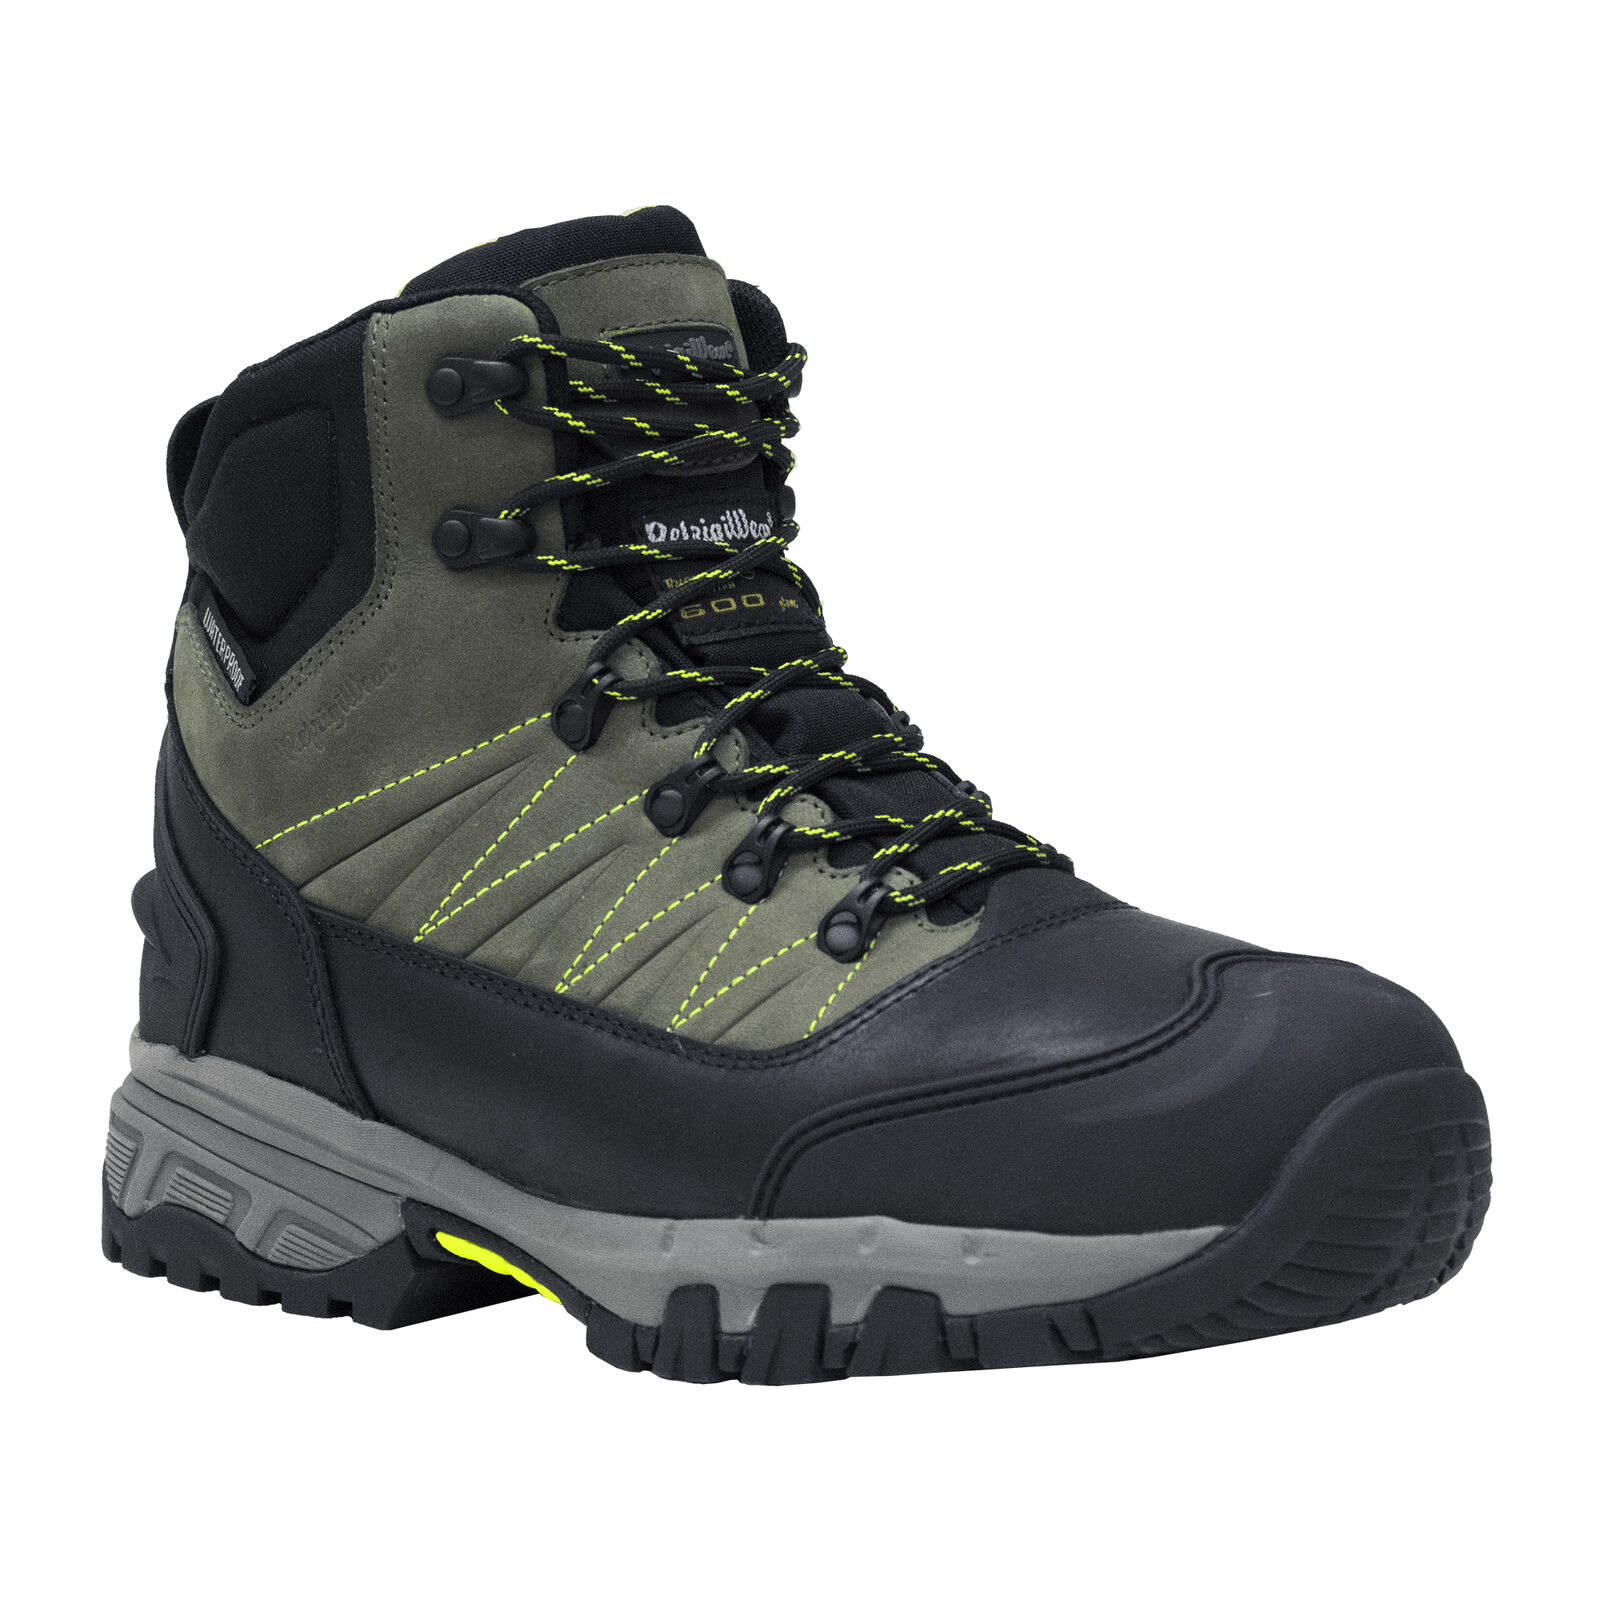 RefrigiWear Men's Tungsten Hiker Warm Insulated Waterproof Leather Work Boots